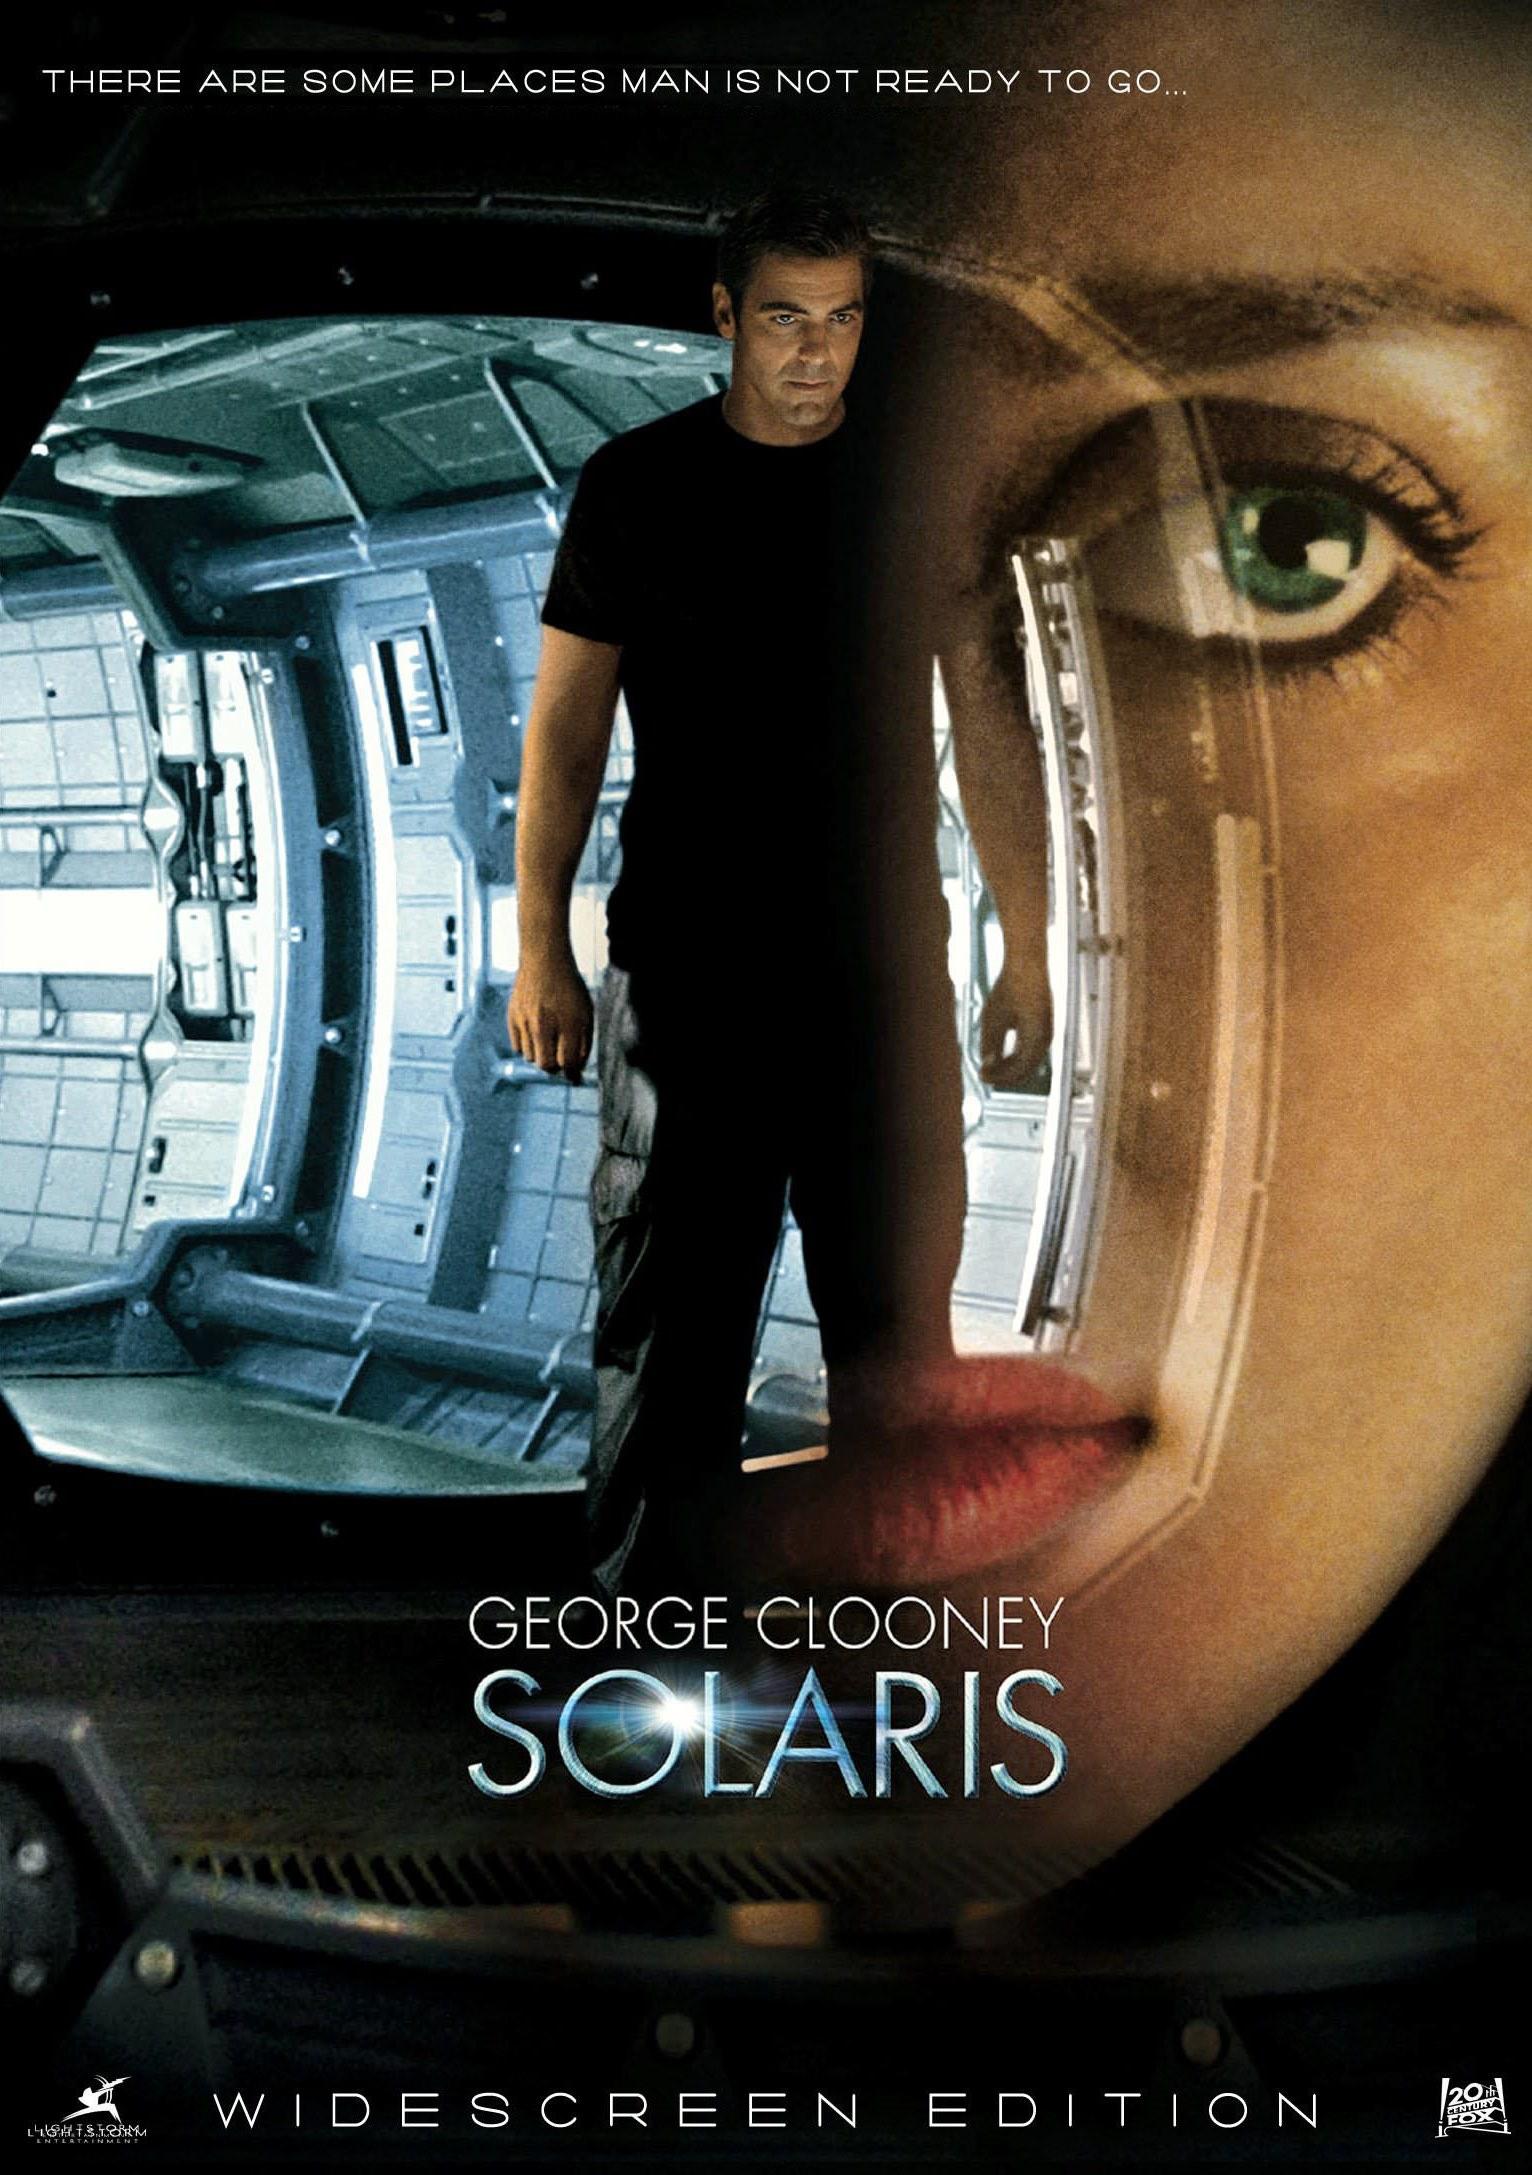 solaris-soderbergh-2002